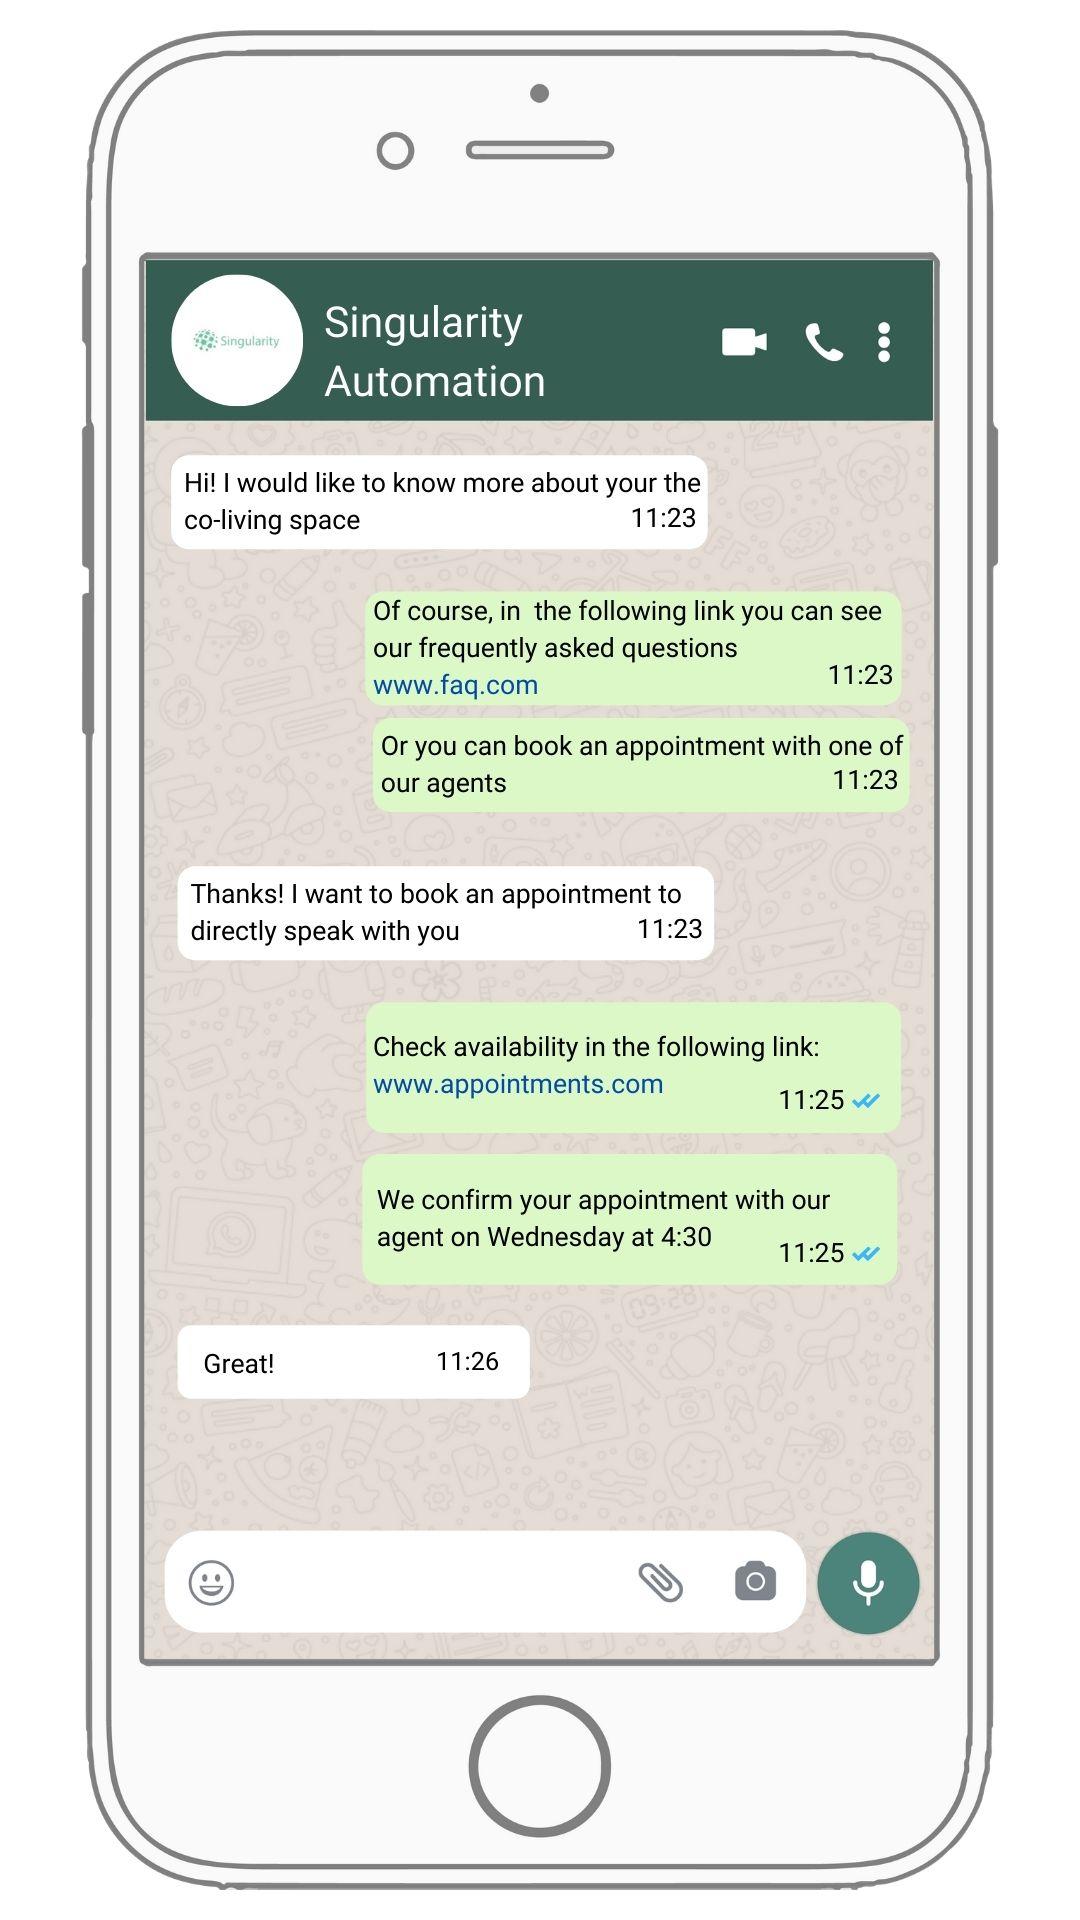 Singularity Automation Mobile